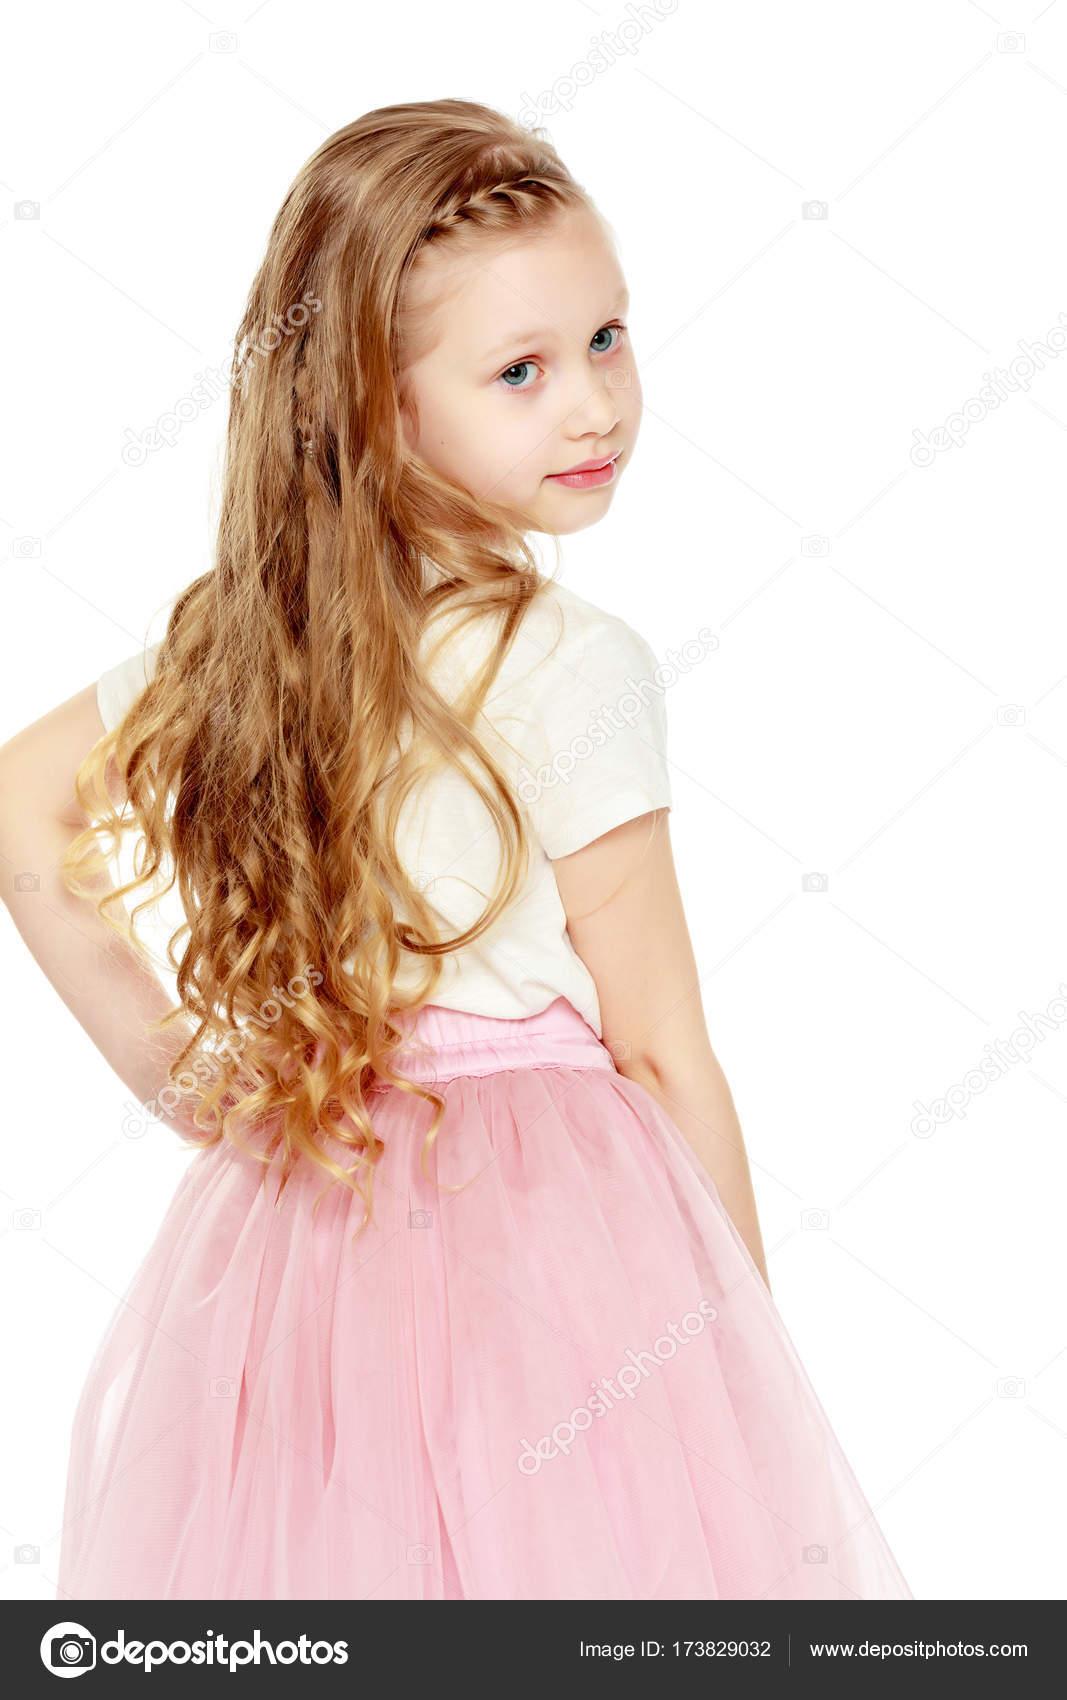 belle petite fille 5 6 ans photographie lotosfoto1 173829032. Black Bedroom Furniture Sets. Home Design Ideas